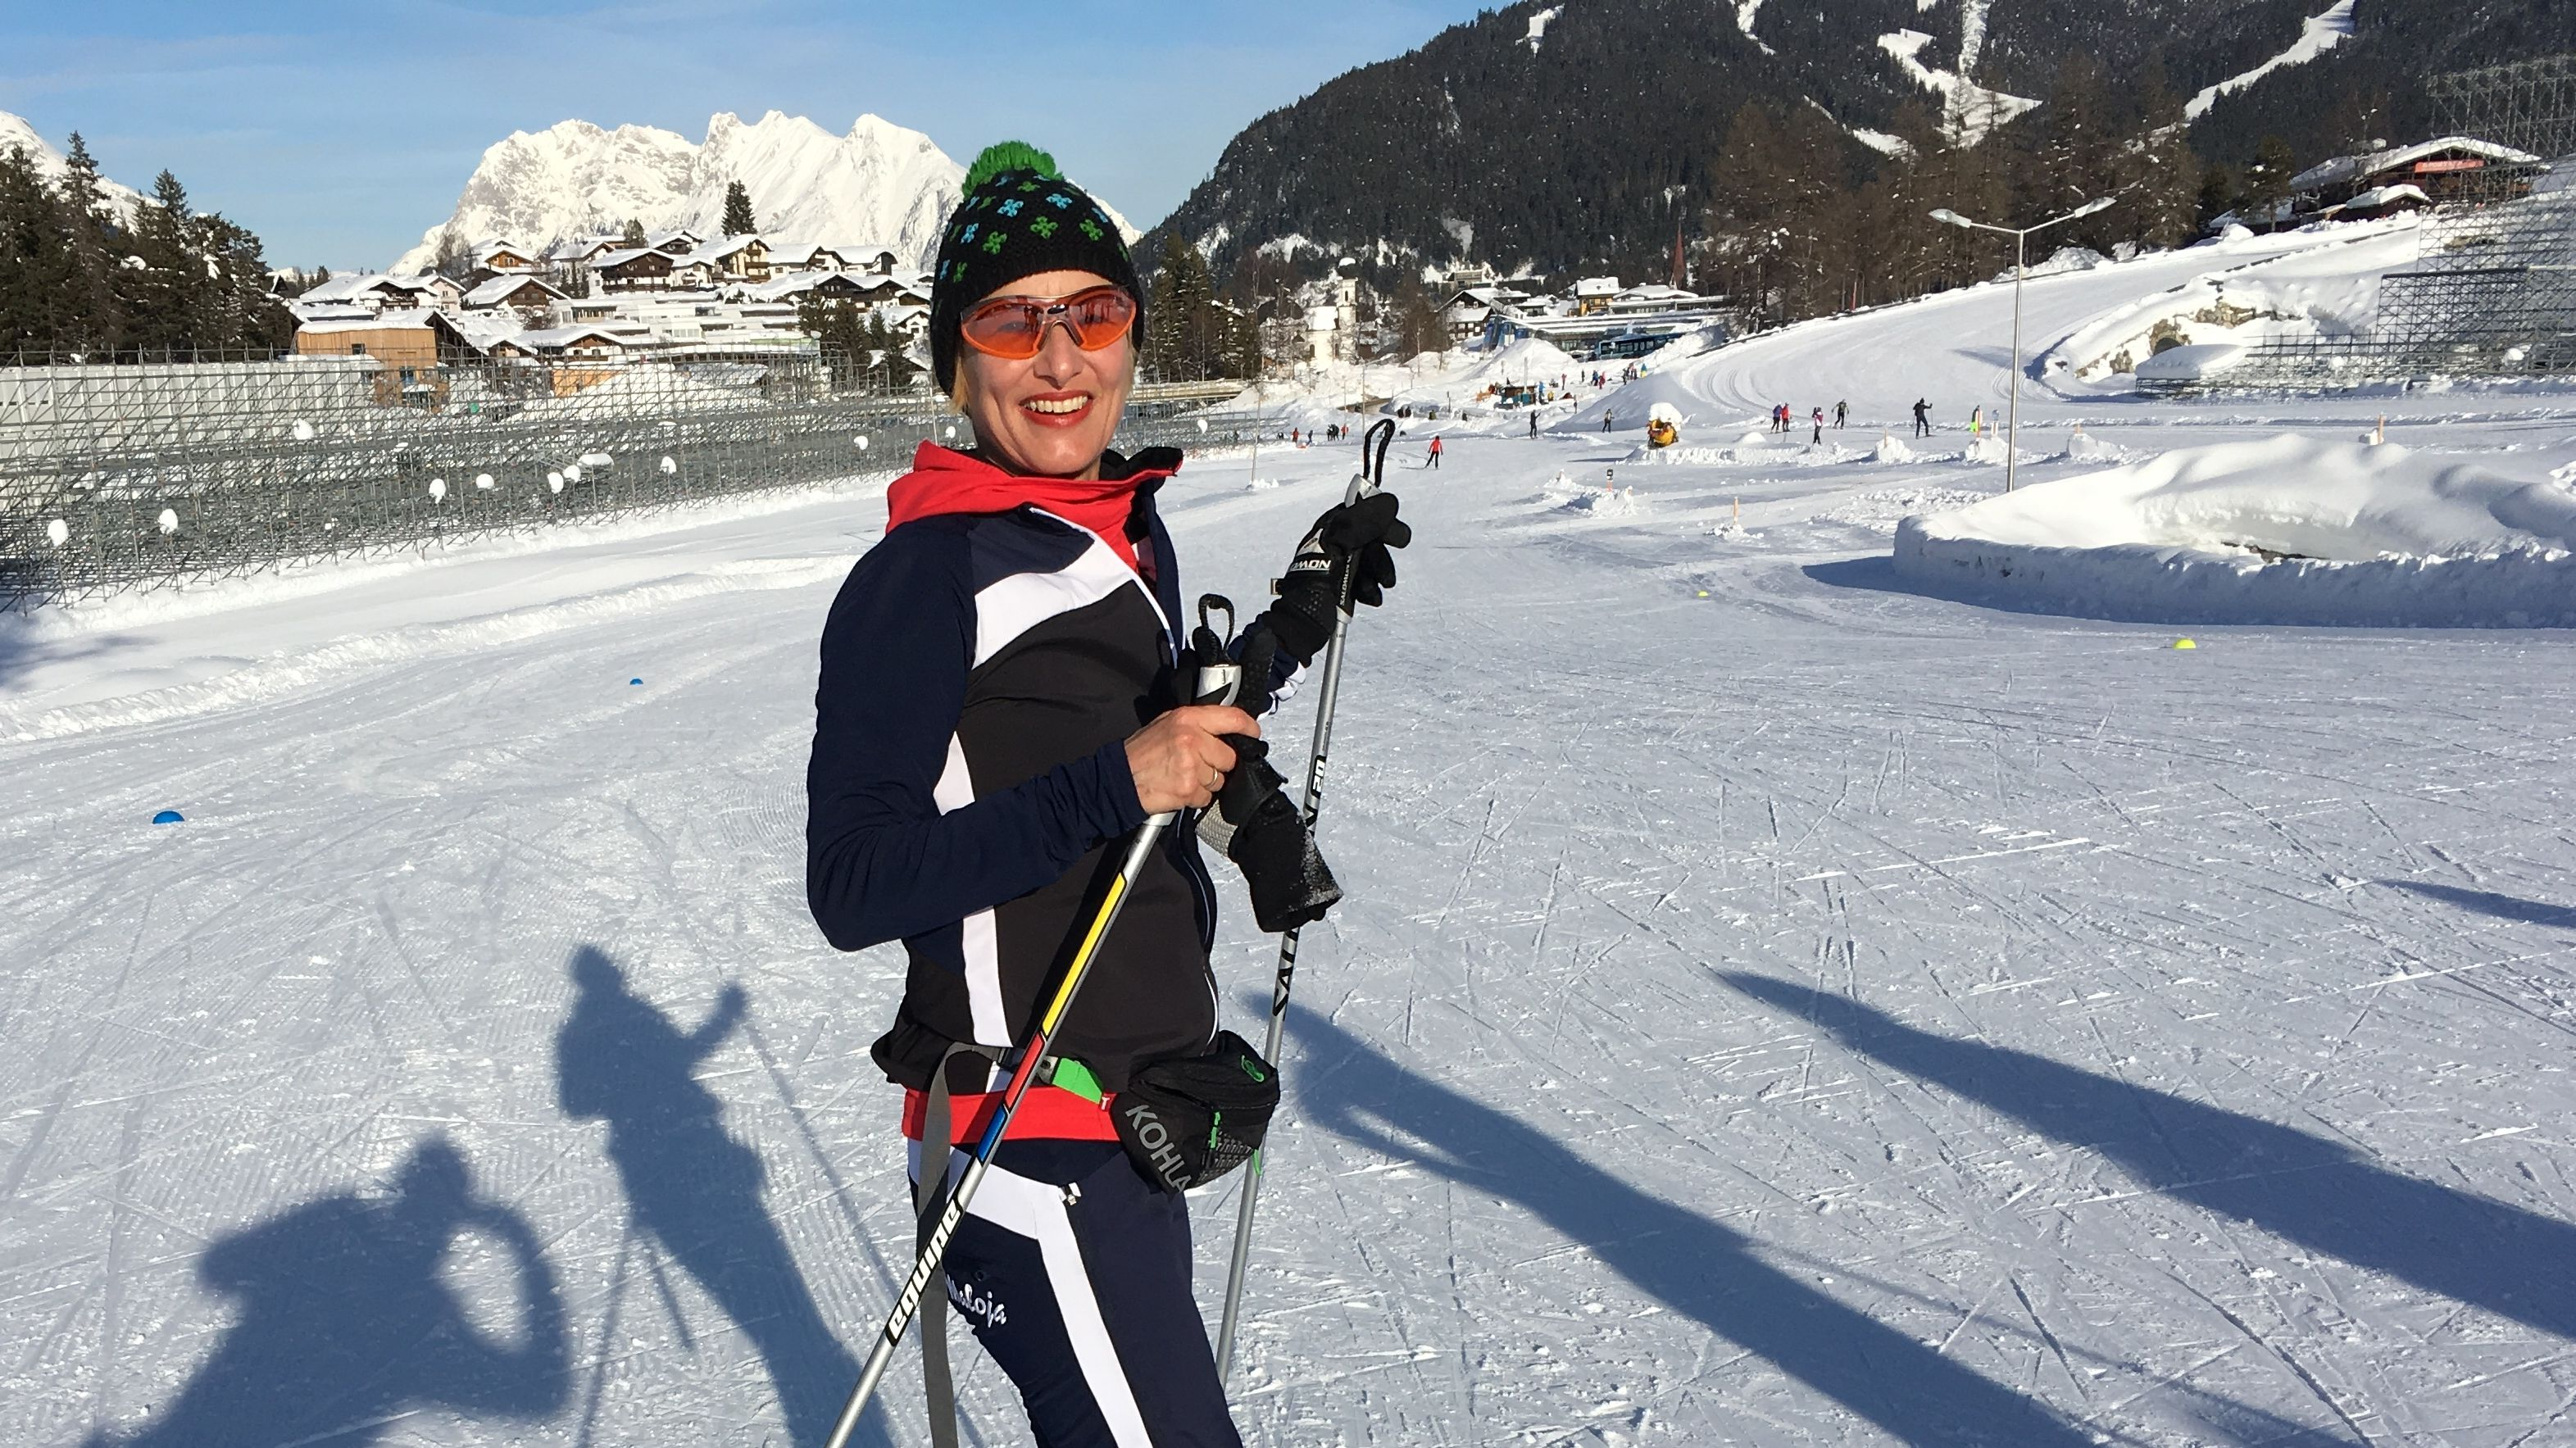 BR-Reporterin Frauke Gerbig beim Langlauf-Camp